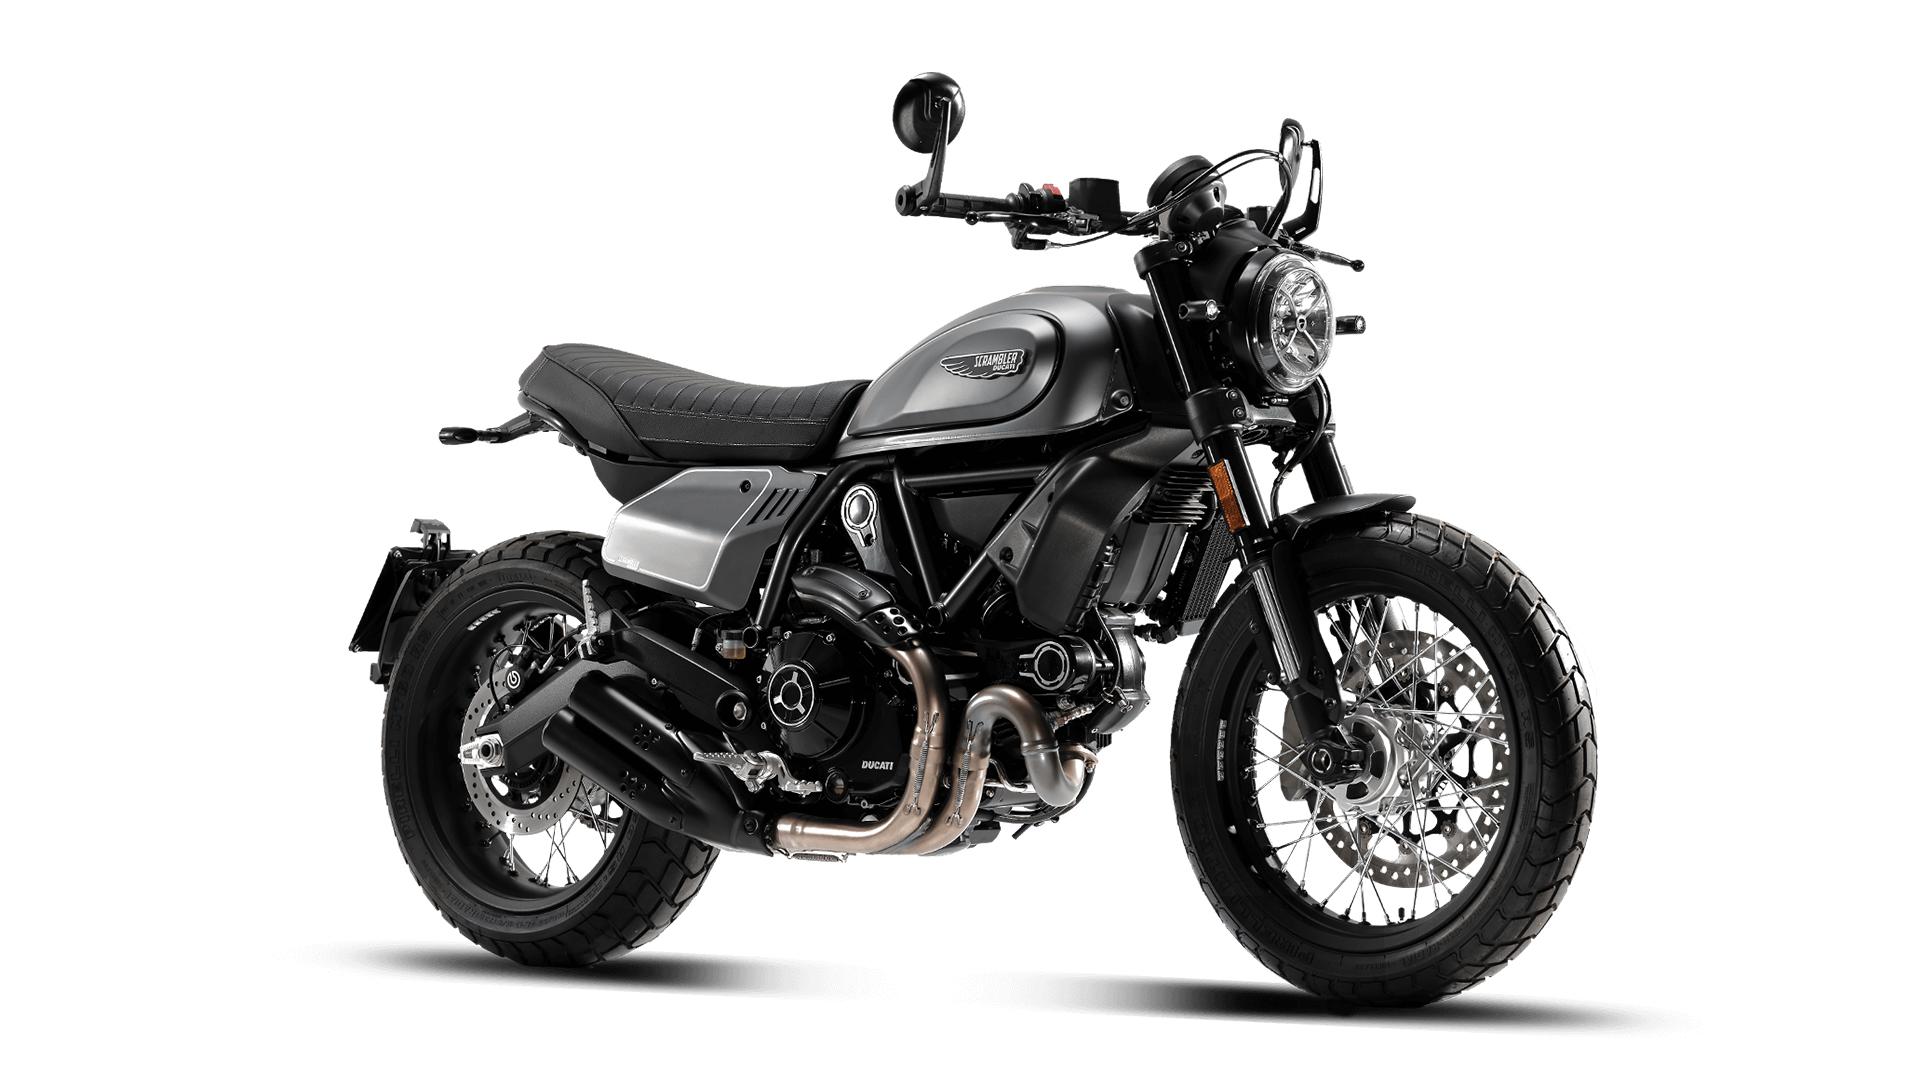 Ducati Scrambler 2021 Nightshift